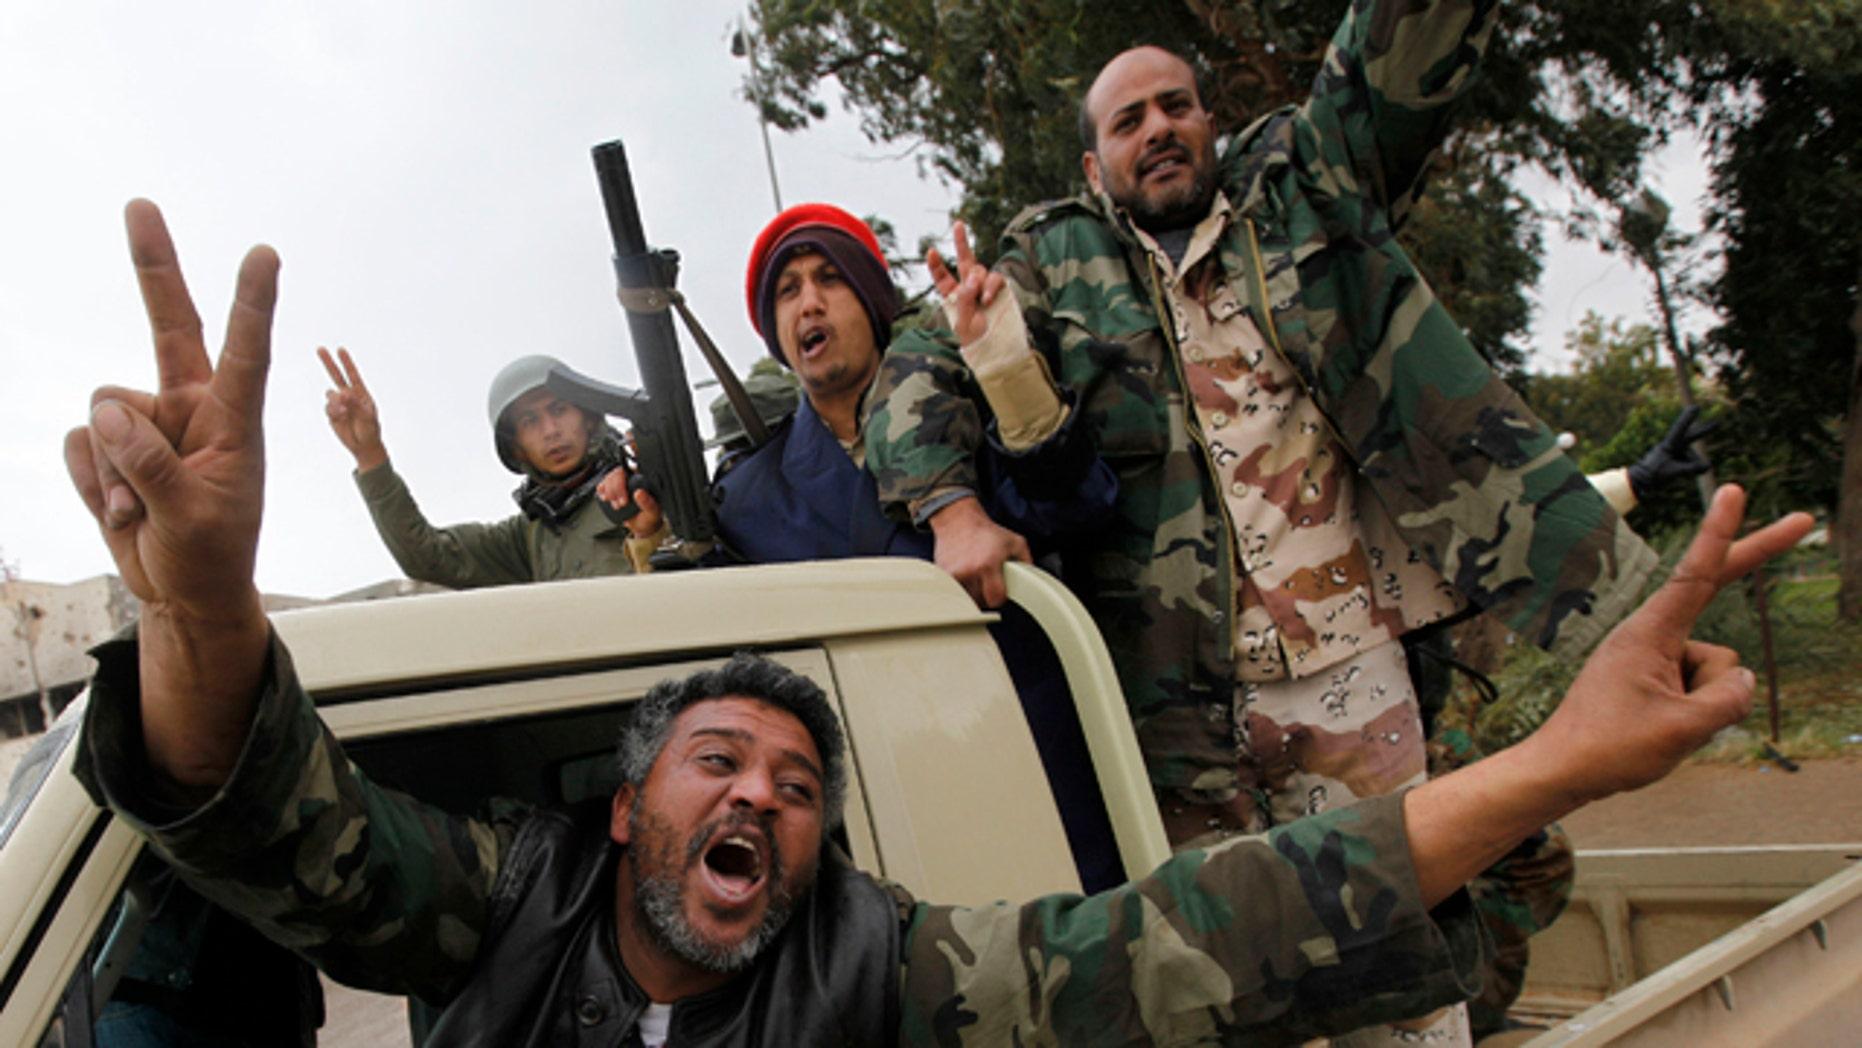 Feb. 27, 2011: Anti-Lybian leader gunmen celebrate the freedom of the Libyan city of Benghazi, Libya. U.S. President Barack Obama has called on Libyan dictator Muammar Qaddafi to leave power immediately.